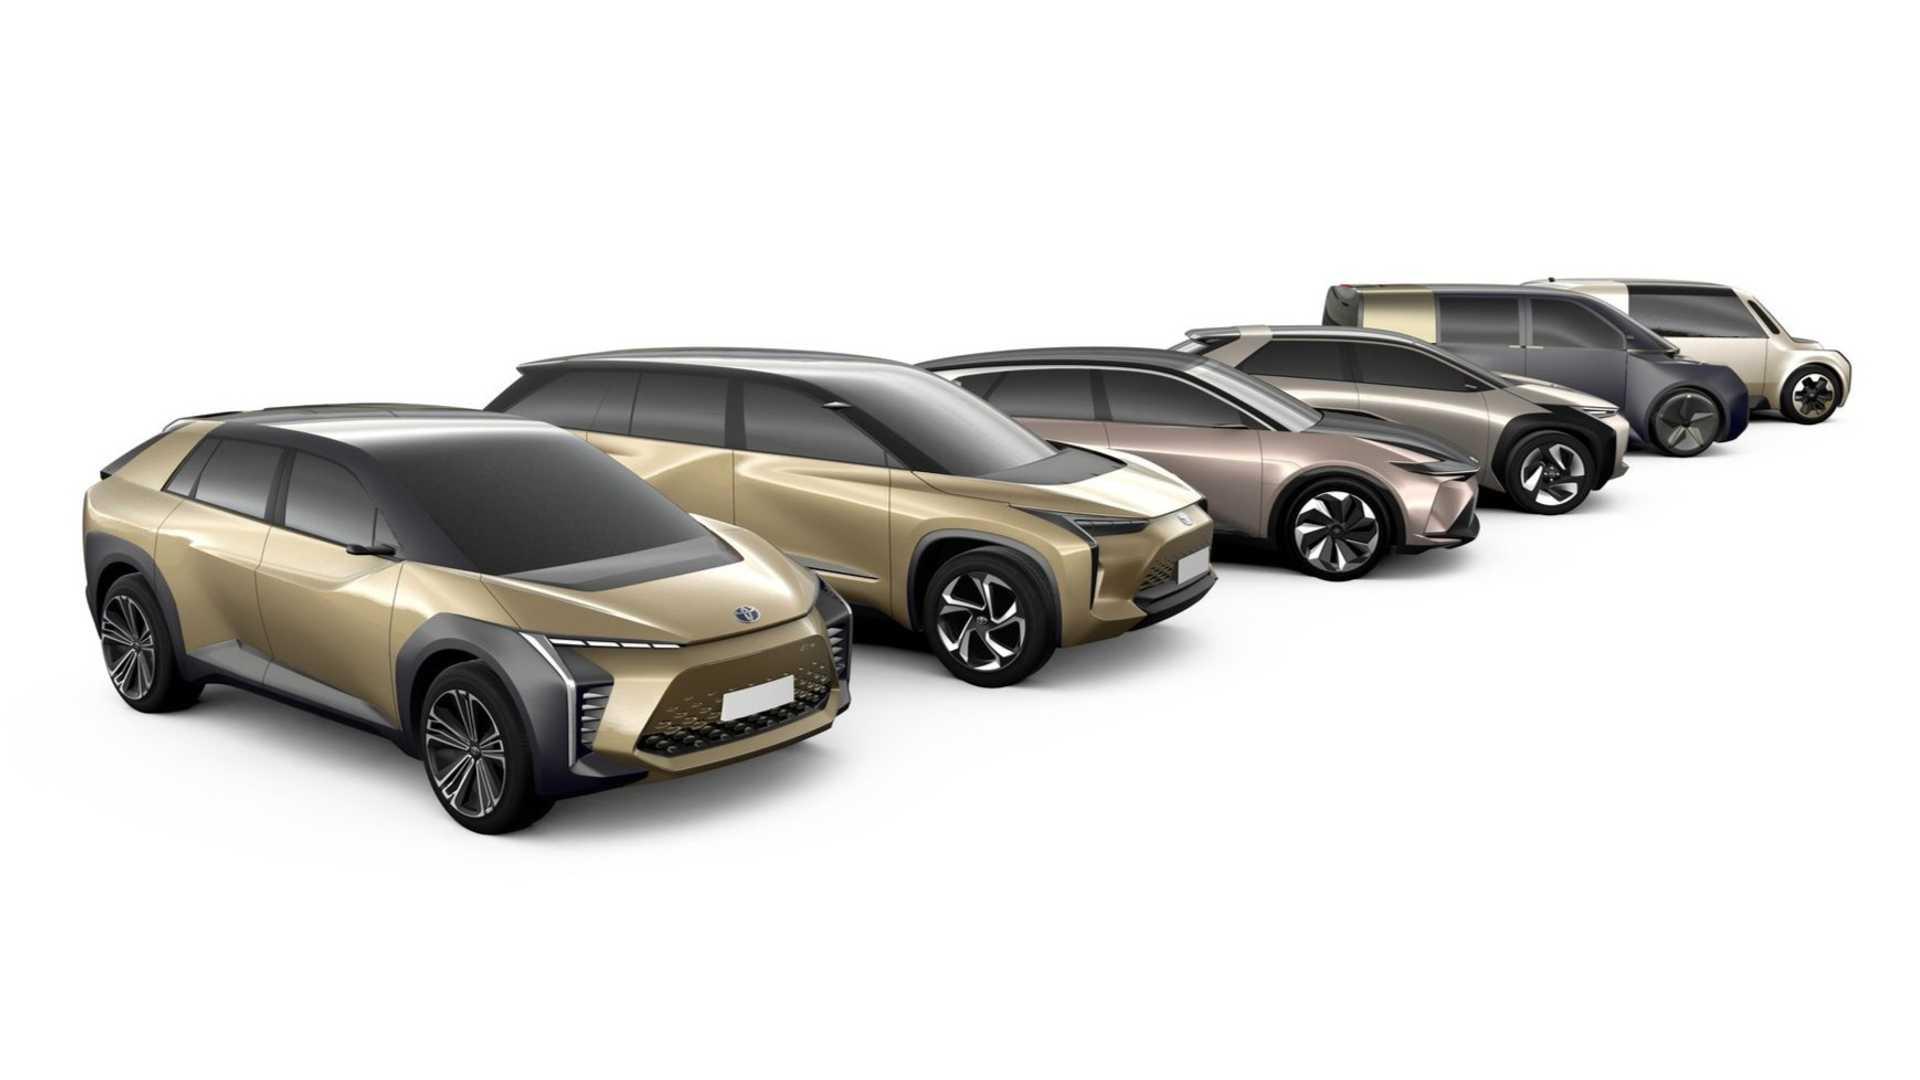 98 Great Toyota Bev 2020 Photos with Toyota Bev 2020